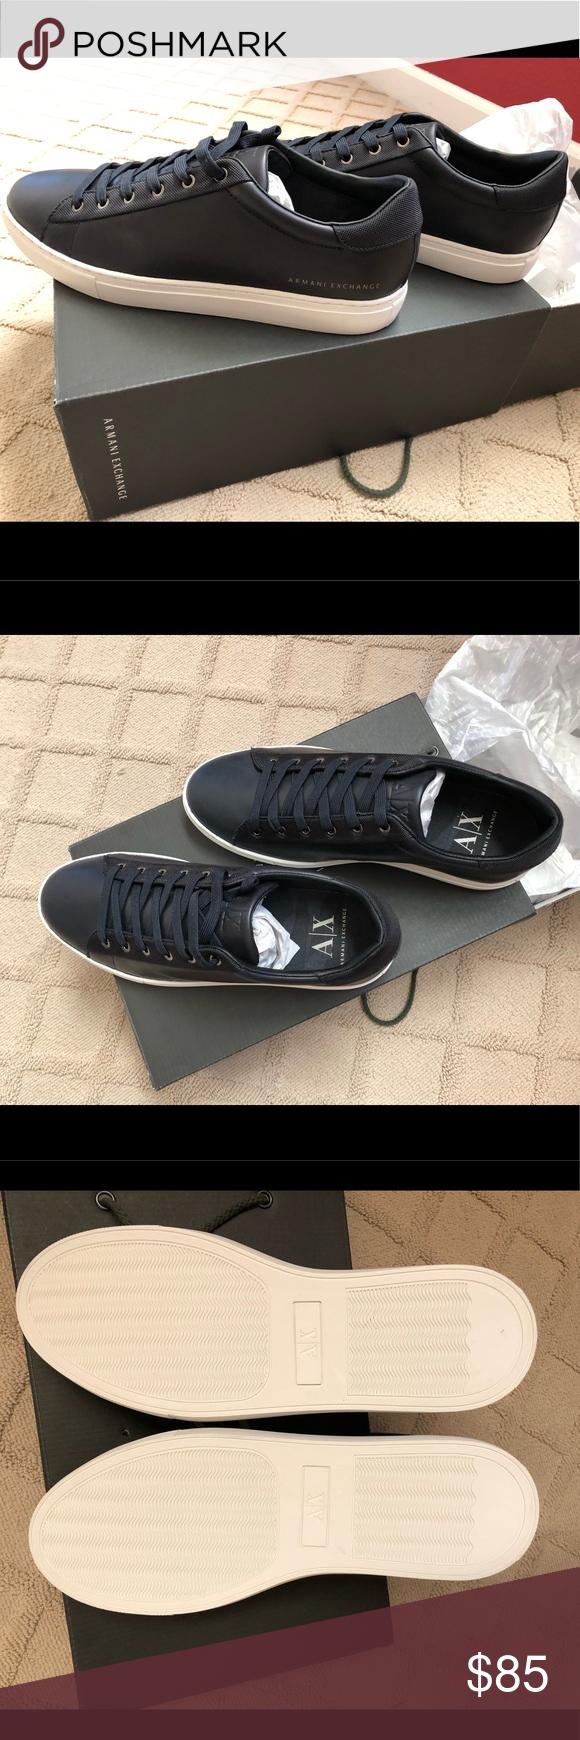 14+ Armani exchange shoes mens ideas information